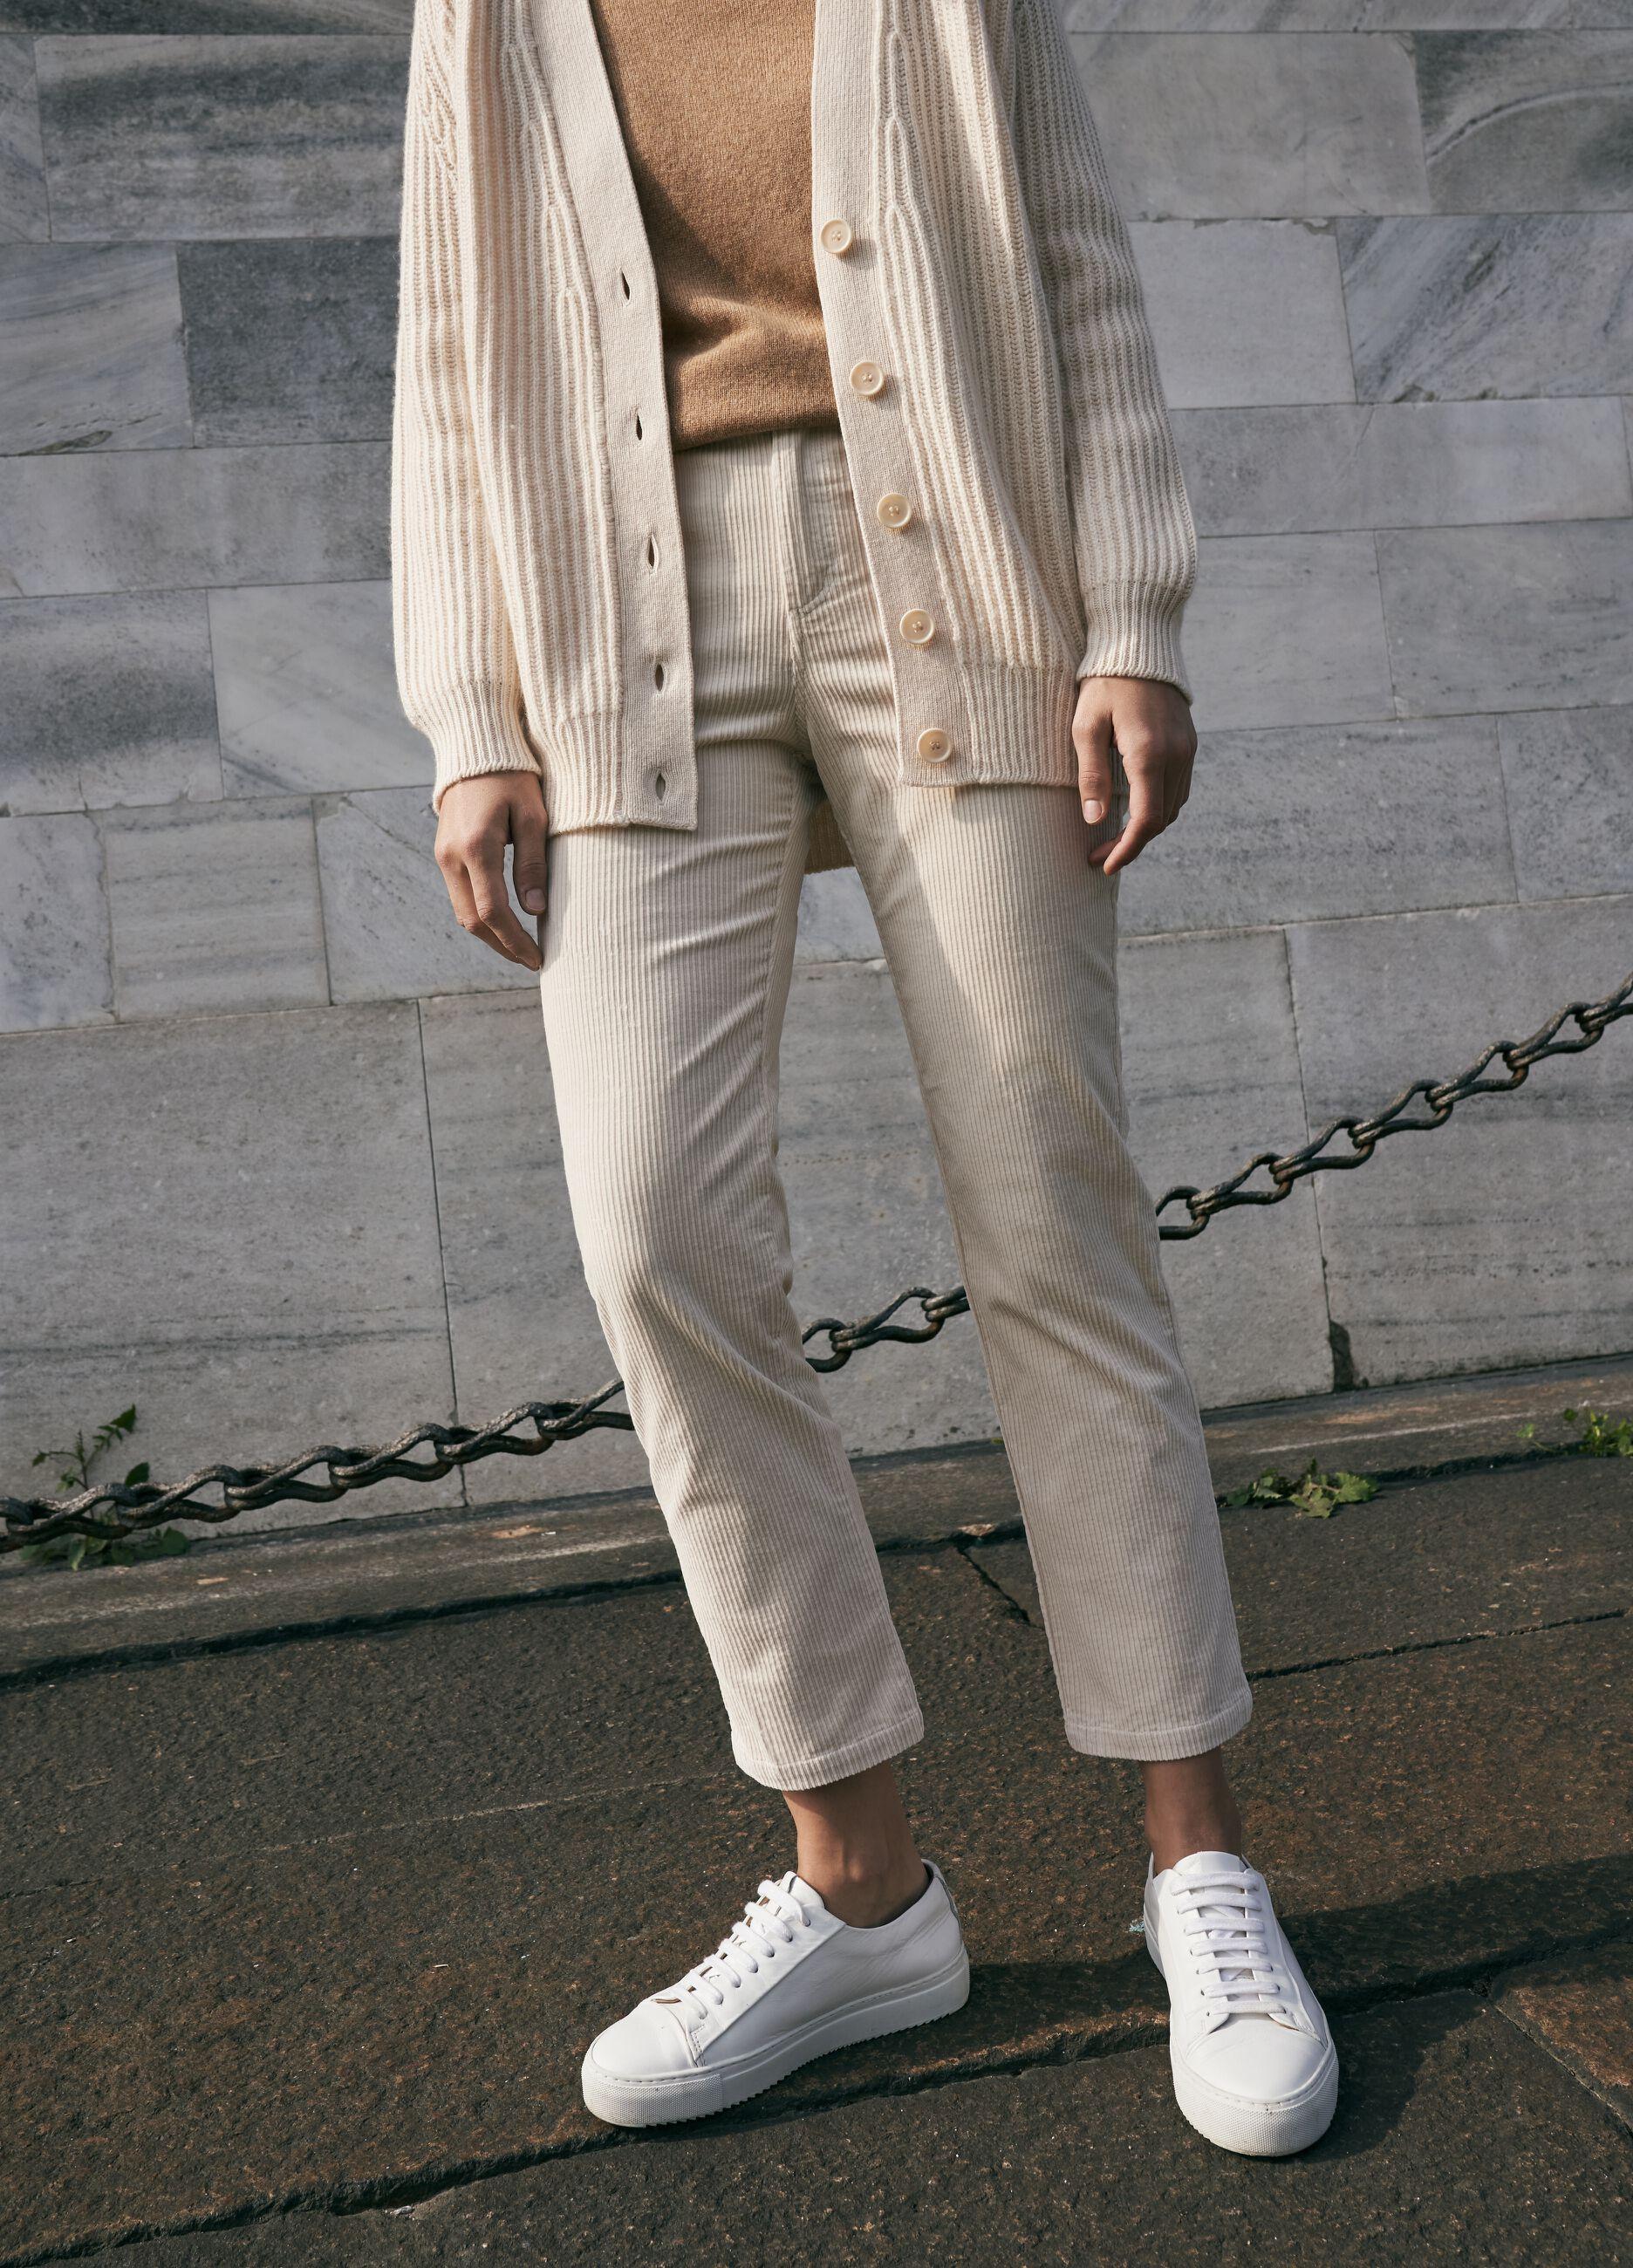 Pantalone chino in corduroy Beige